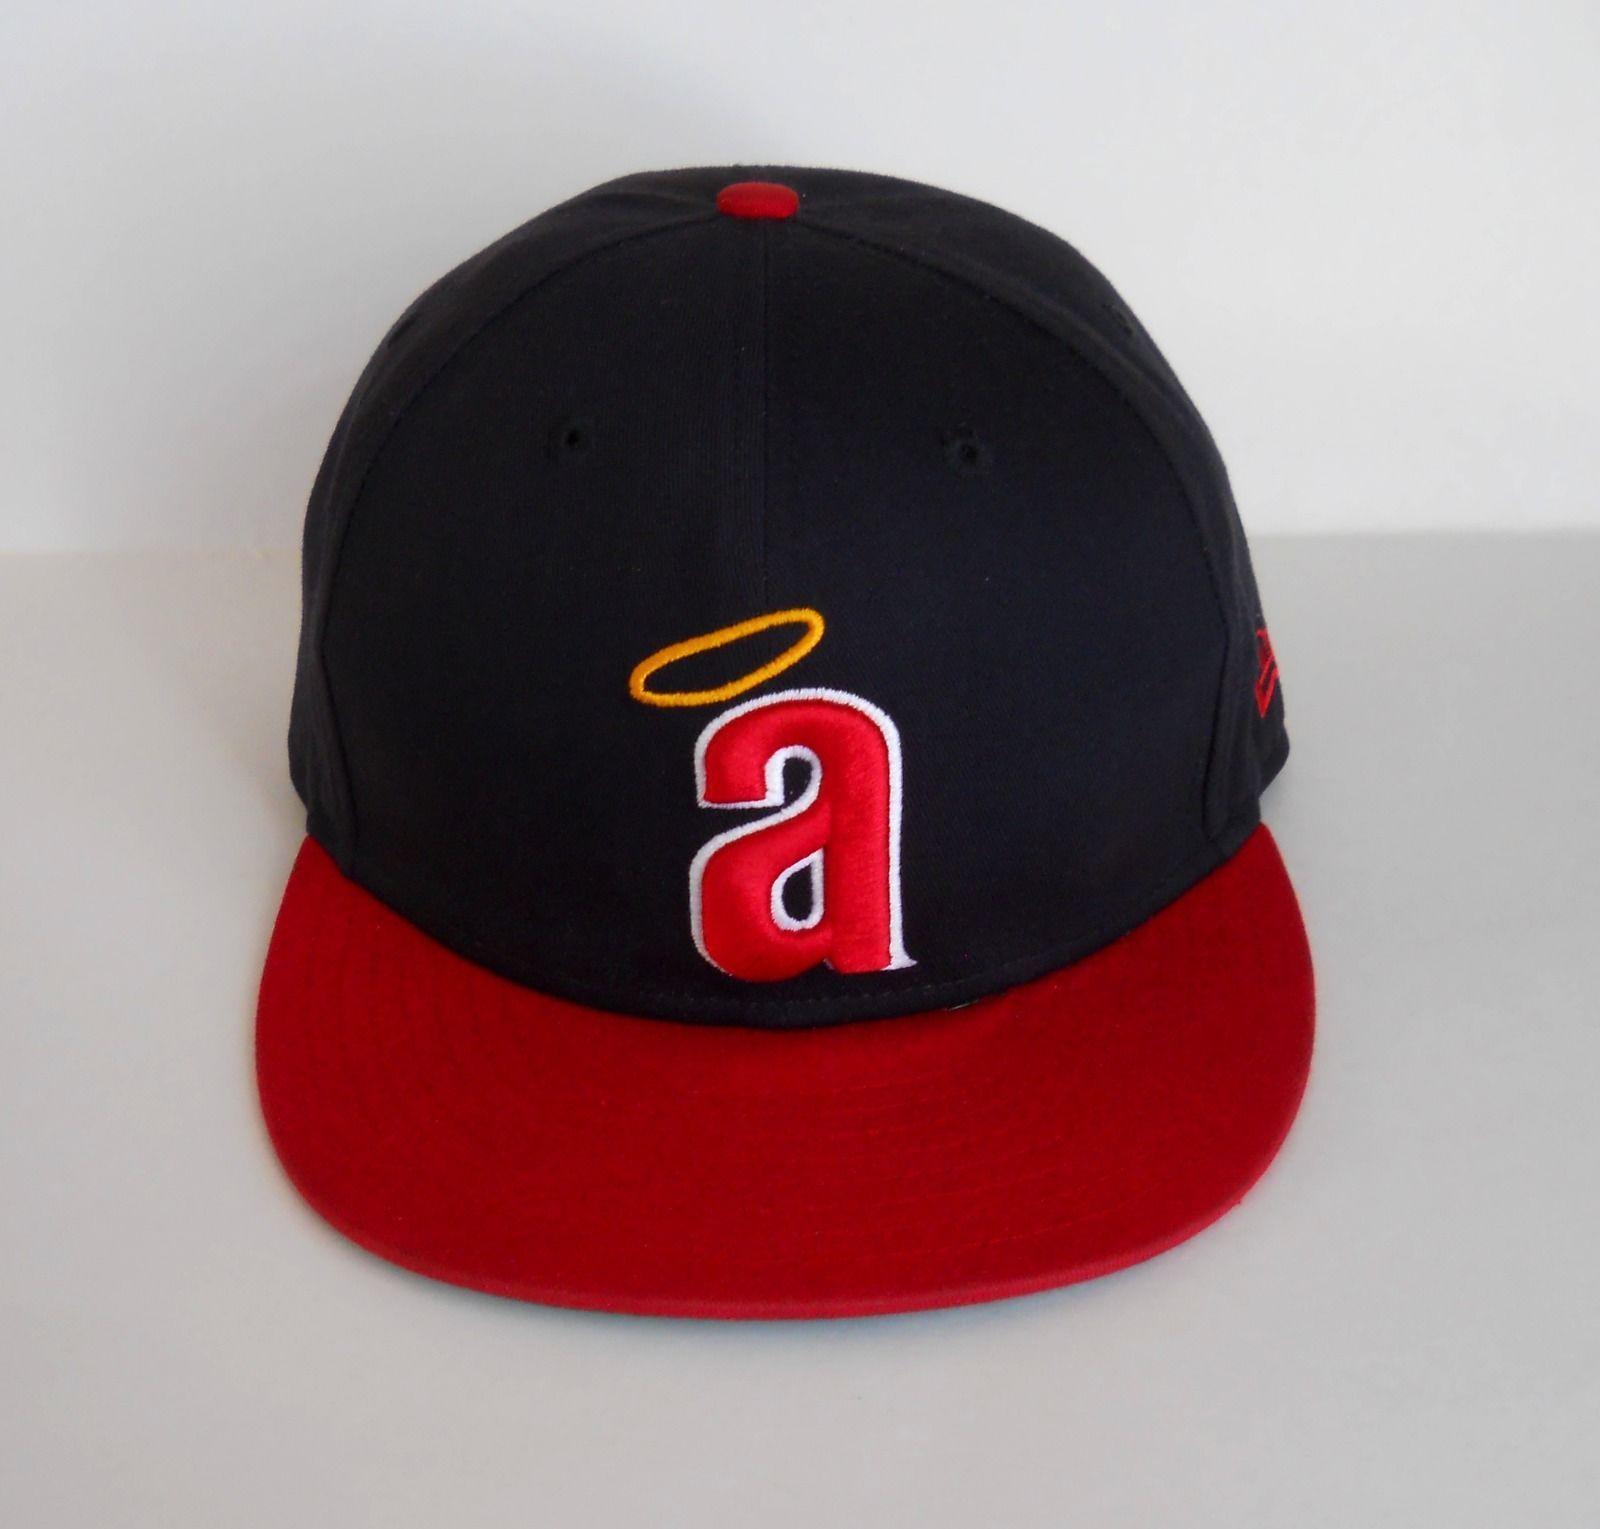 Anaheim California Angels New Era Cooperstown Halo Mlb Snapback Hat Snapback Hats New Era Anaheim California